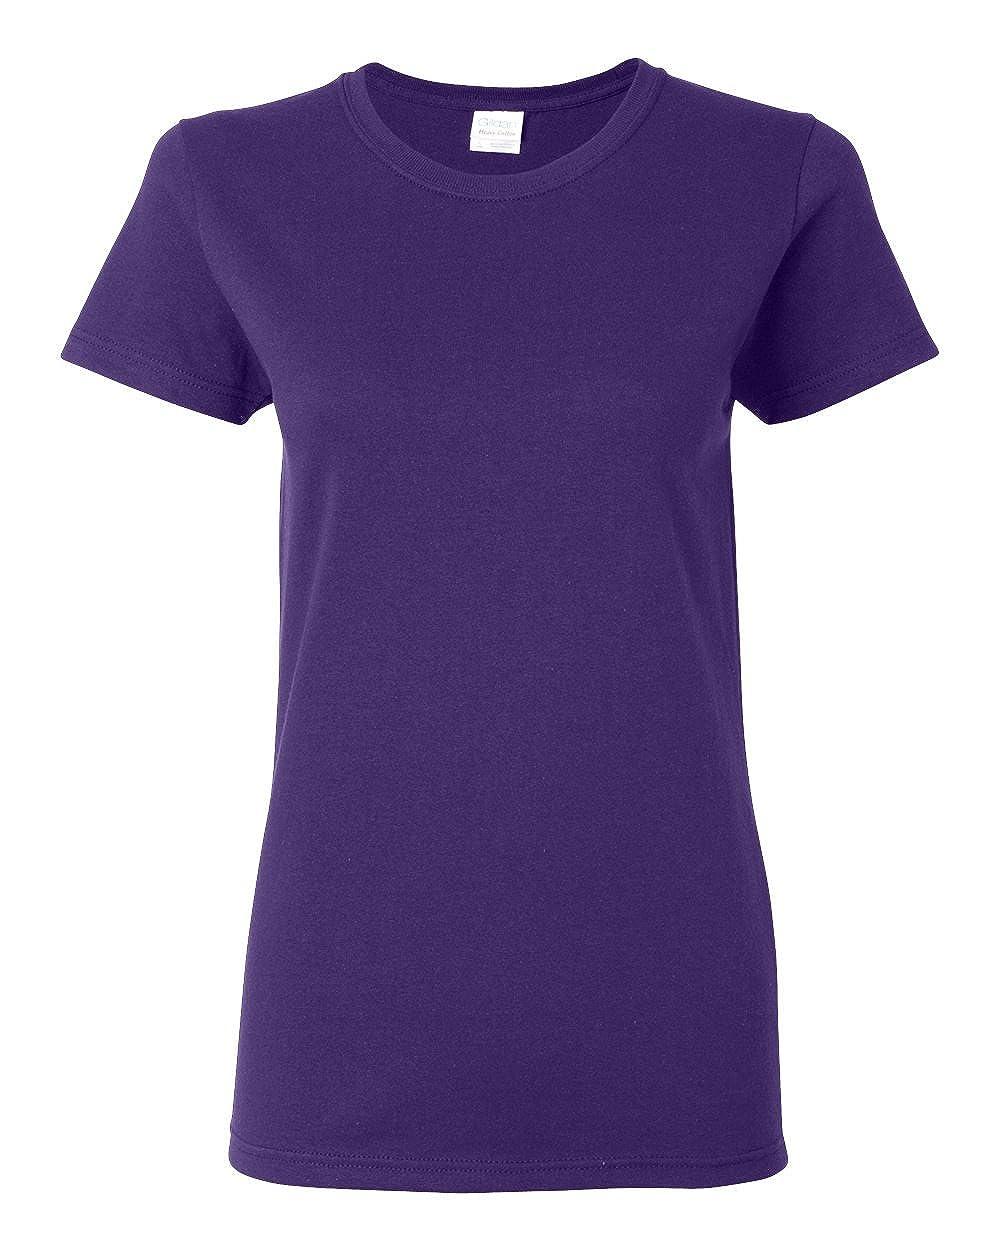 Purple Gildan Womens 5.3 oz. Heavy Cotton Missy Fit TShirt G500L (Pack of 12)